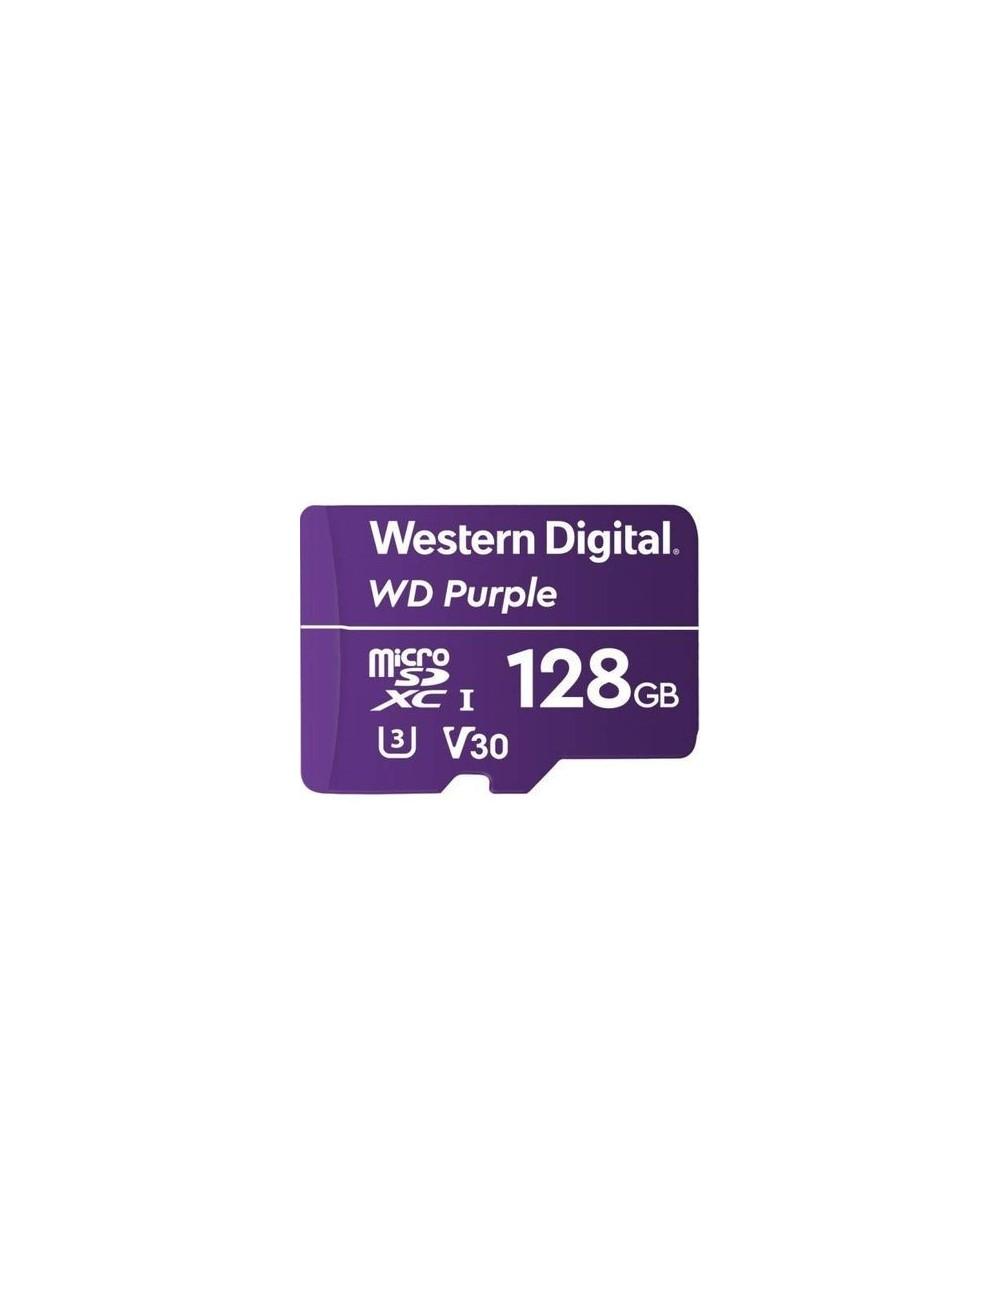 WD Purple microSDXC UHS-1 card